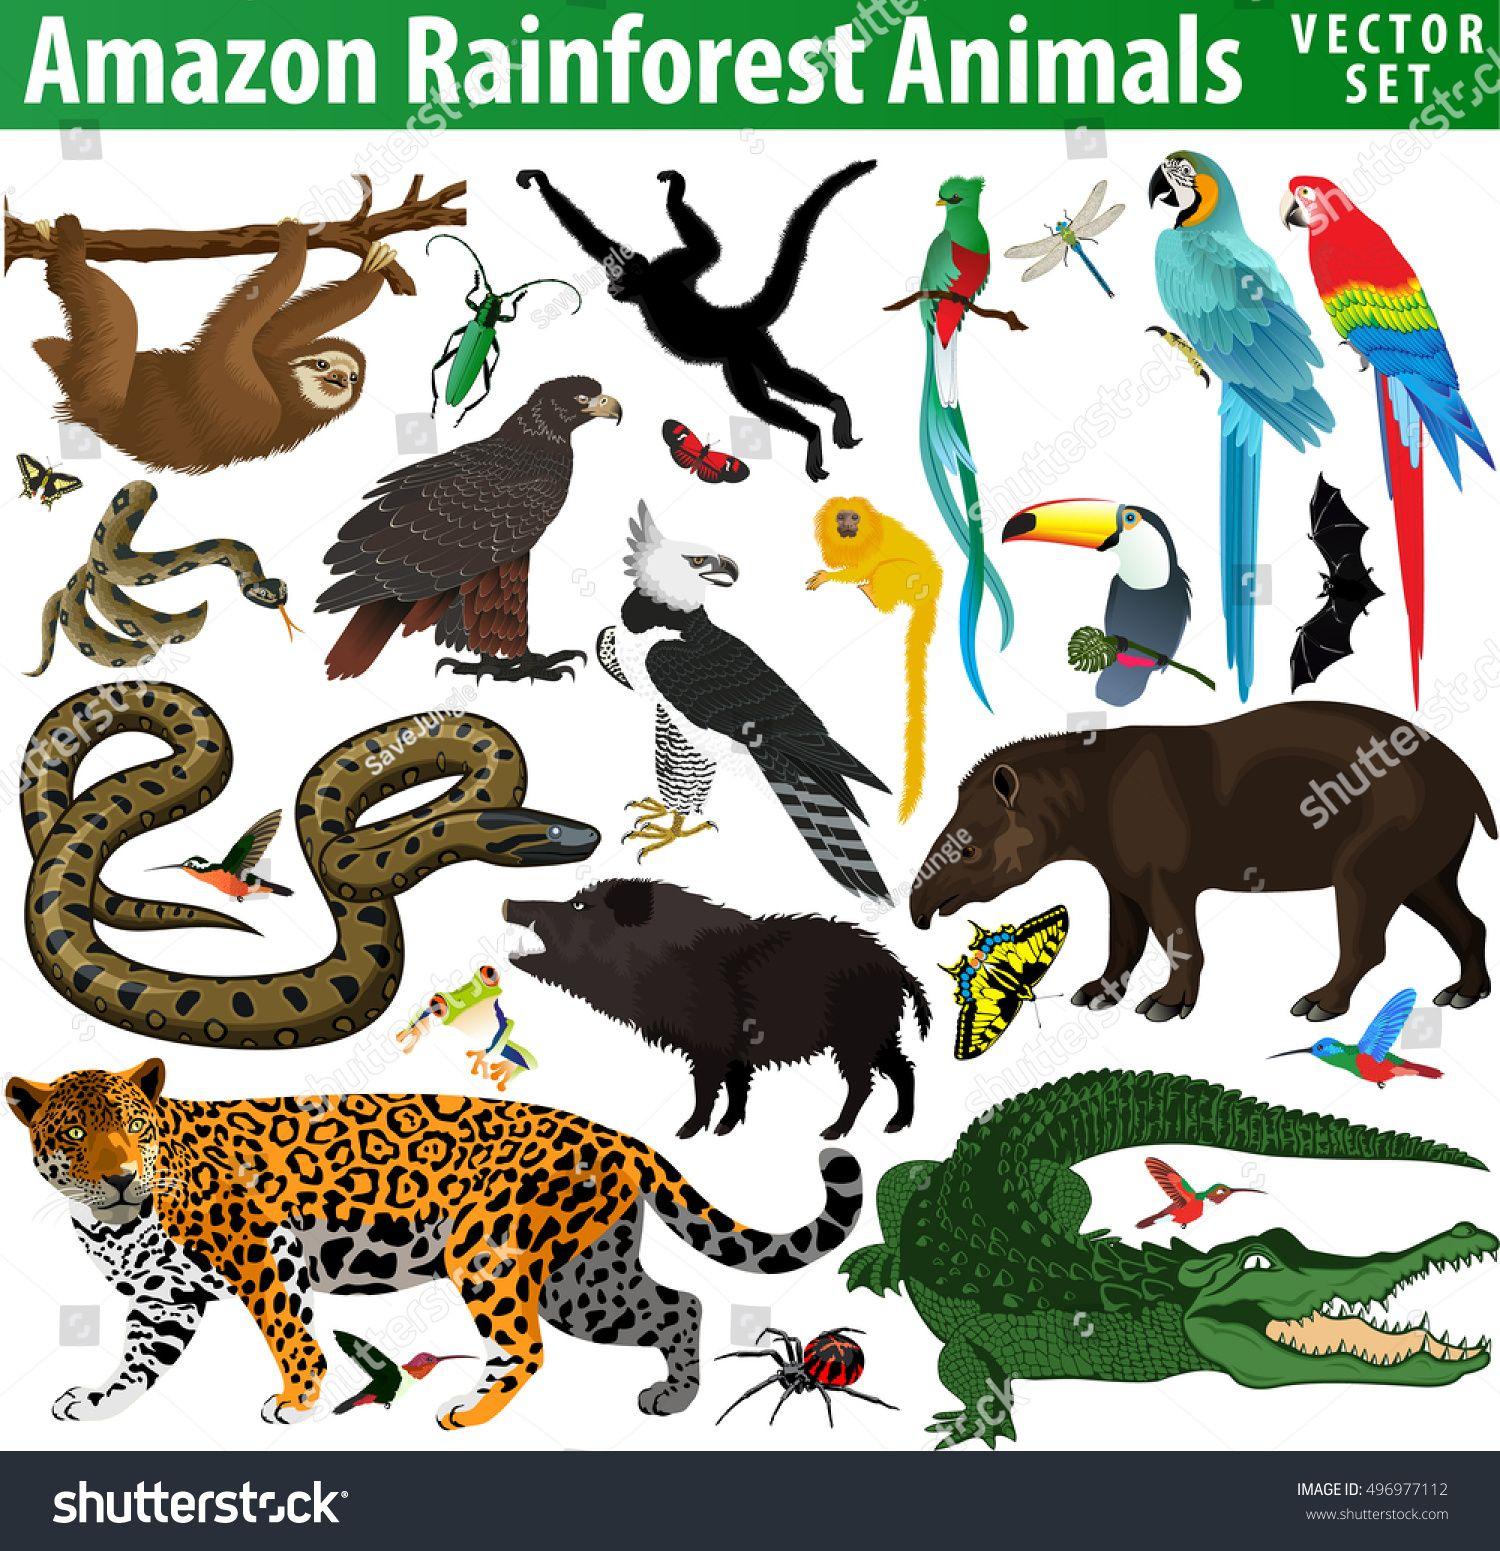 Set Of Vector Amazon Rainforest Jungle Animals Image Vector